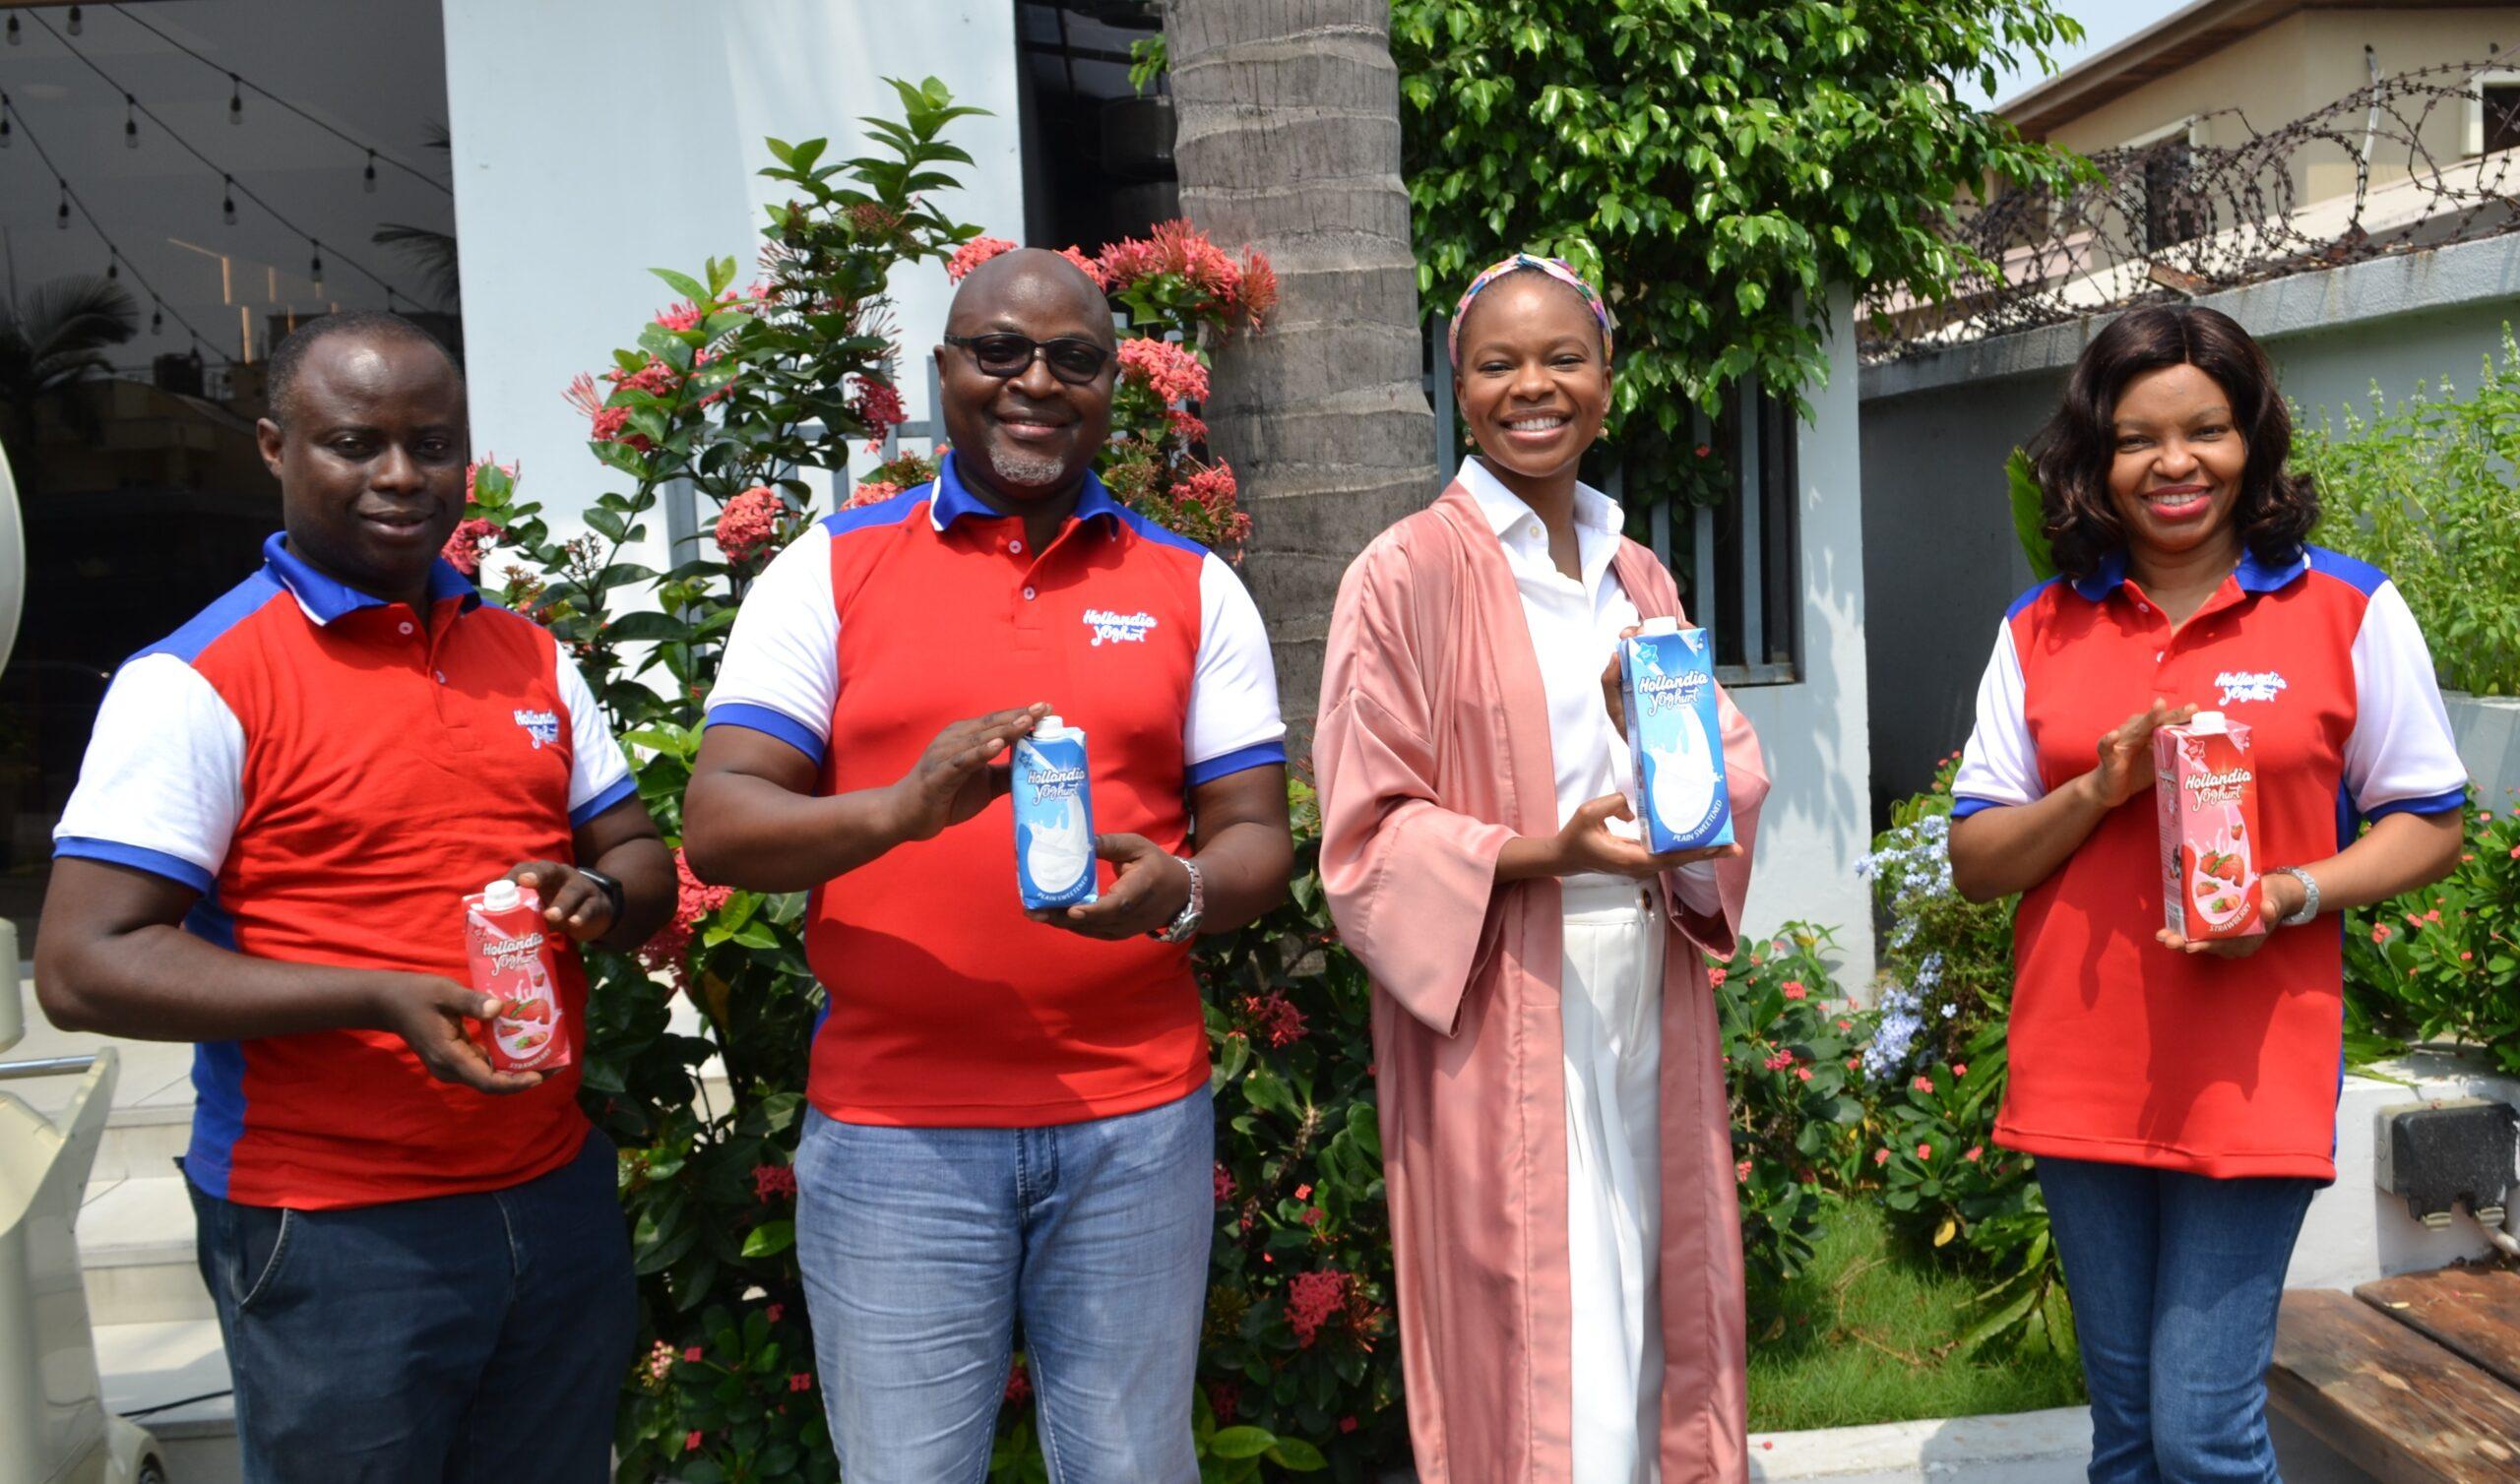 Hollandia Yoghurt Signs On Zainab Balogun-Nwachukwu As Brand Ambassador Brandnewsday